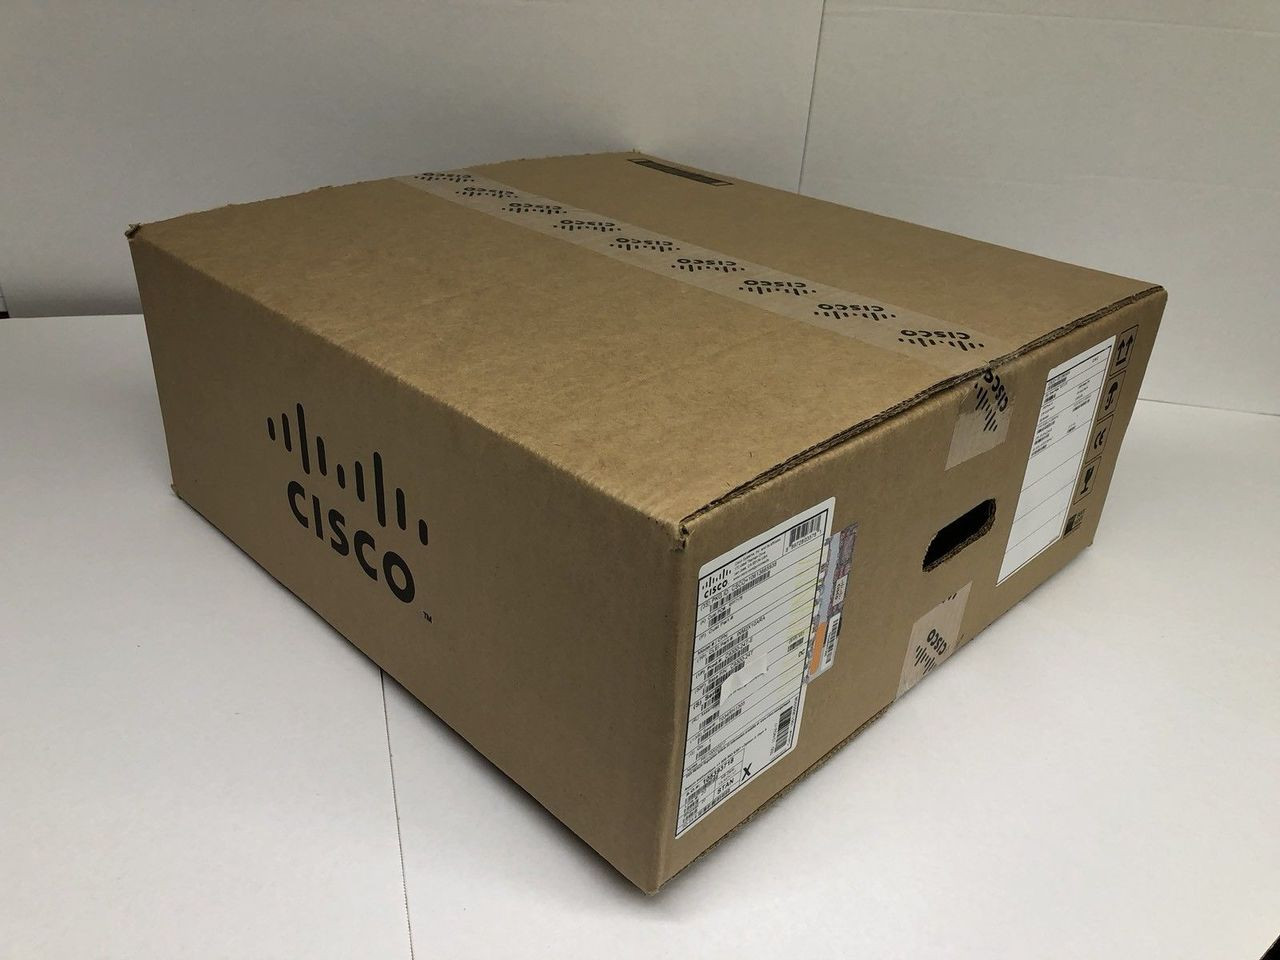 CISCO C9300-24P-A CATALYST 9300 MANAGED L3 SWITCH - 24 POE+ ETHERNET PORTS,  NETWORK ADVANTAGE